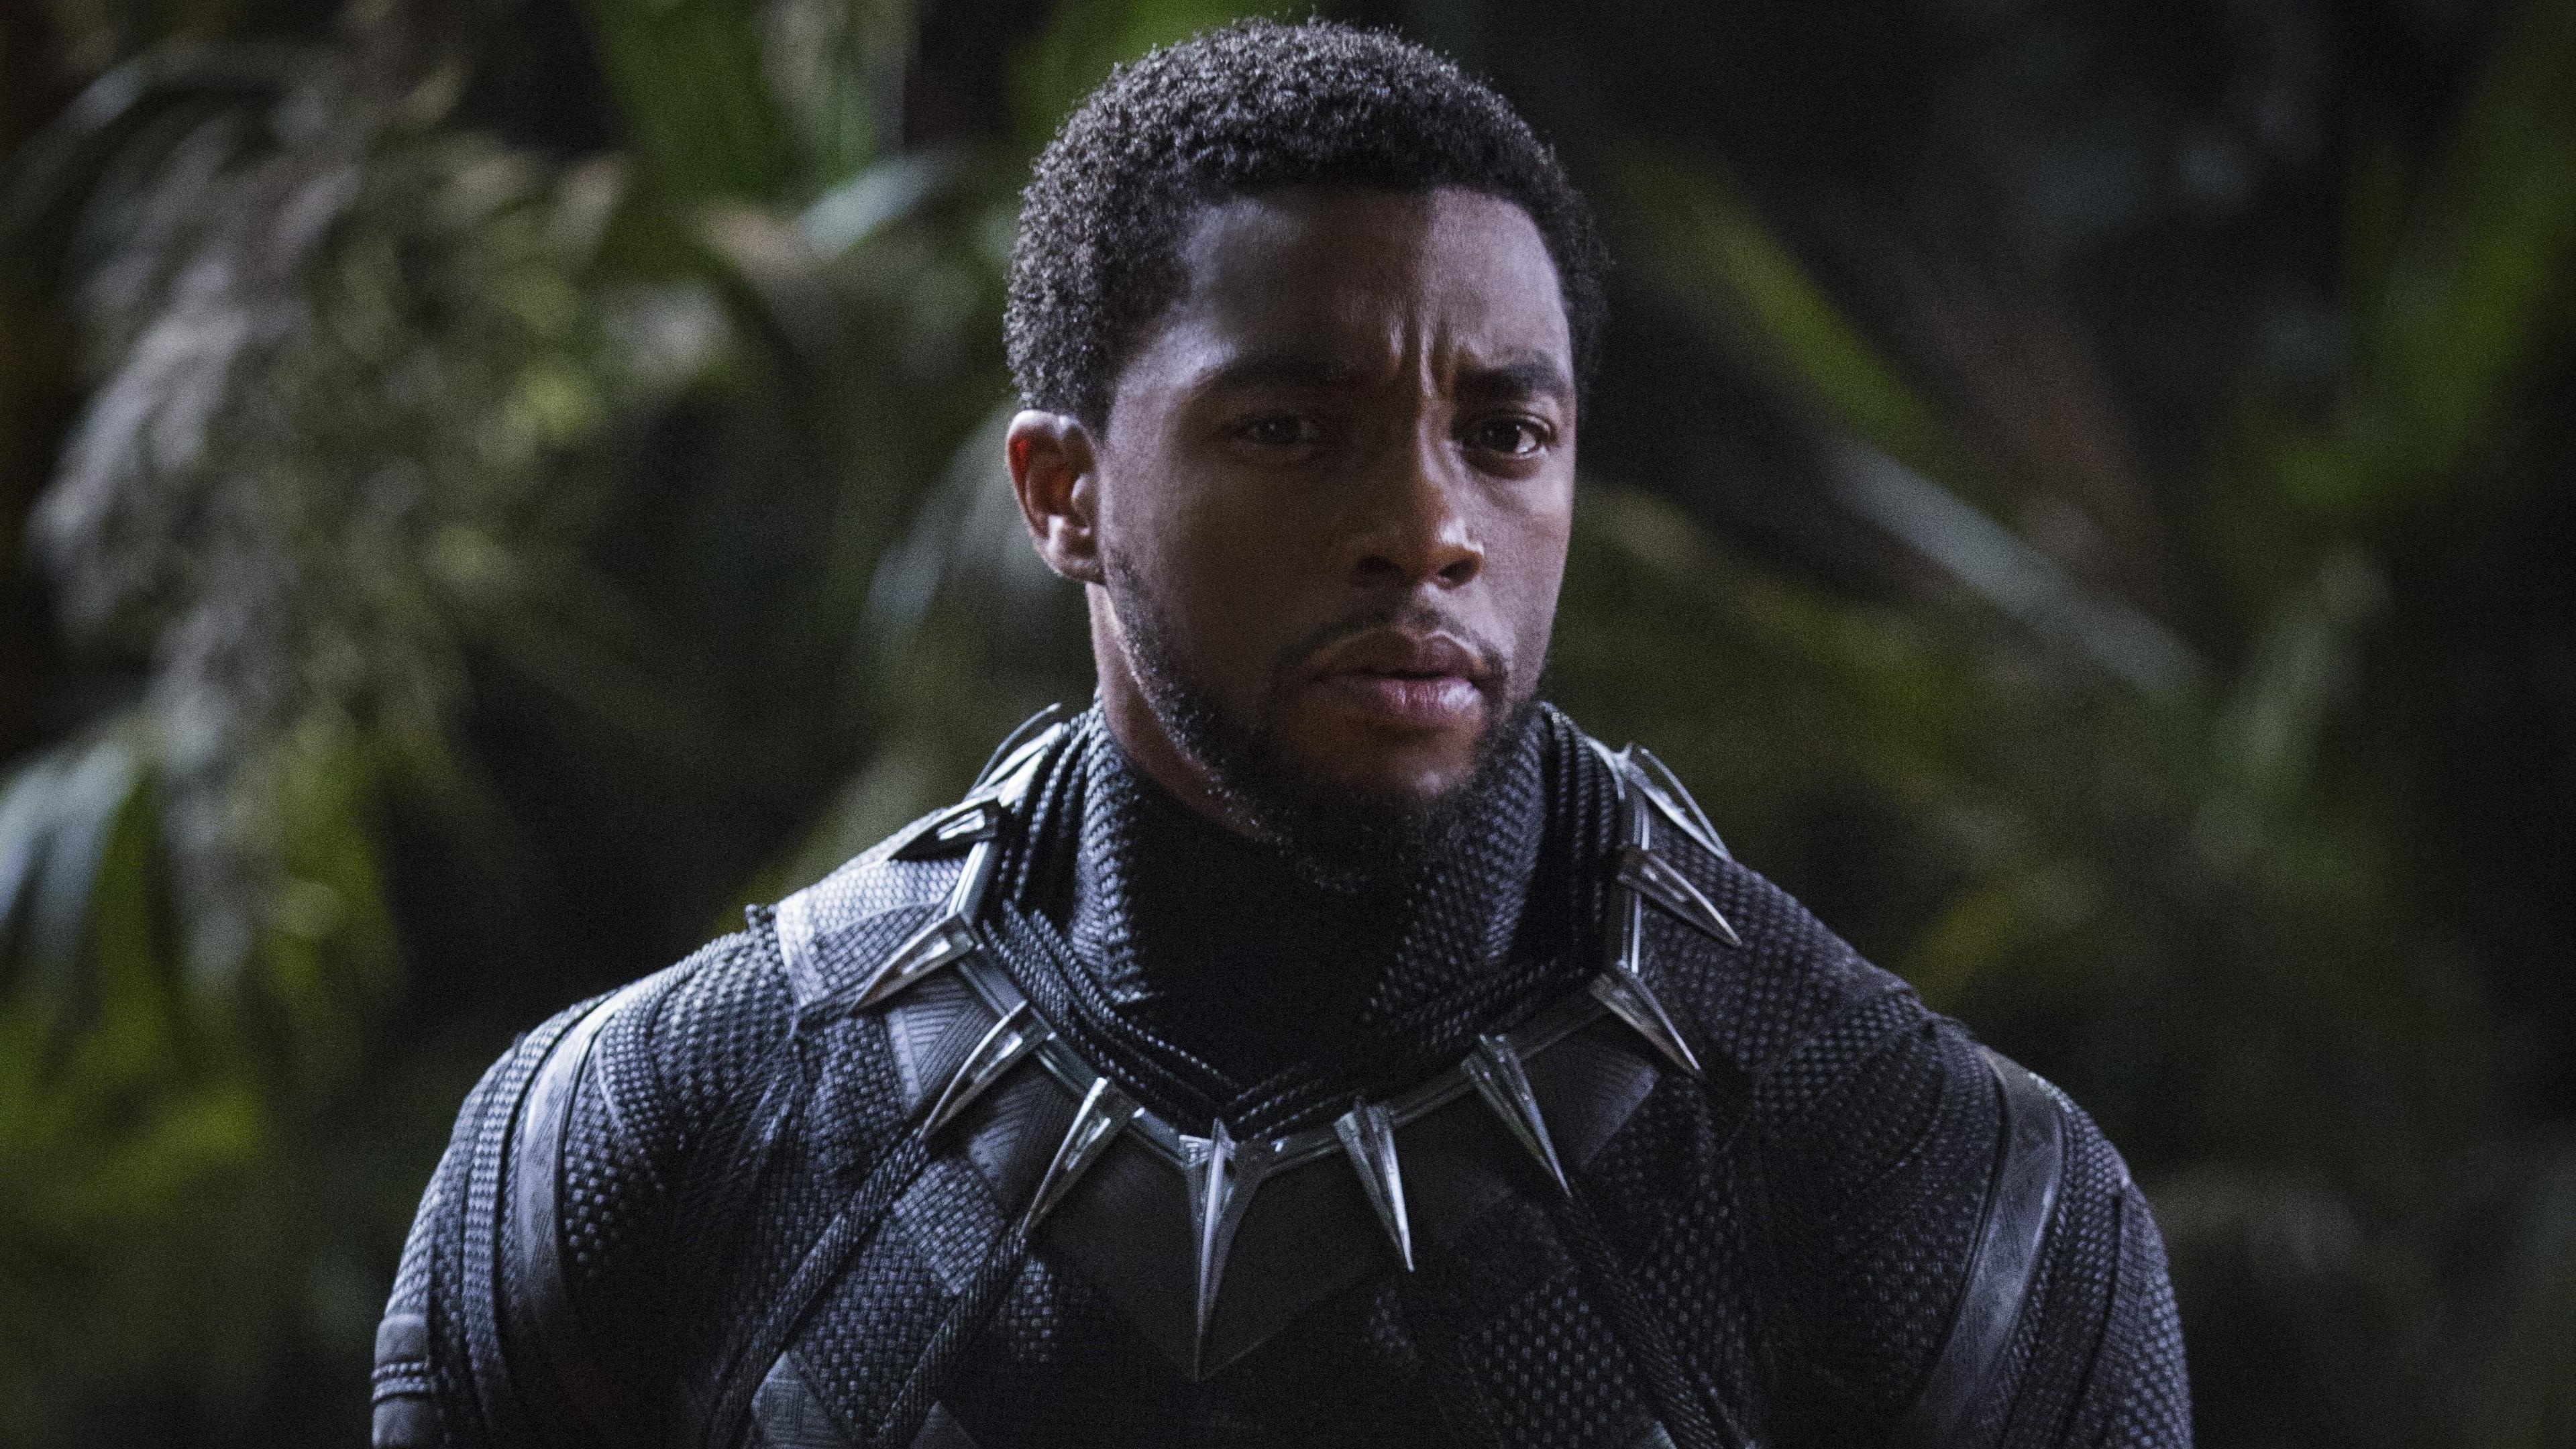 Desktop Wallpaper Chadwick Boseman Black Panther 2018 Movie 4k Hd Image Picture Background 241abf